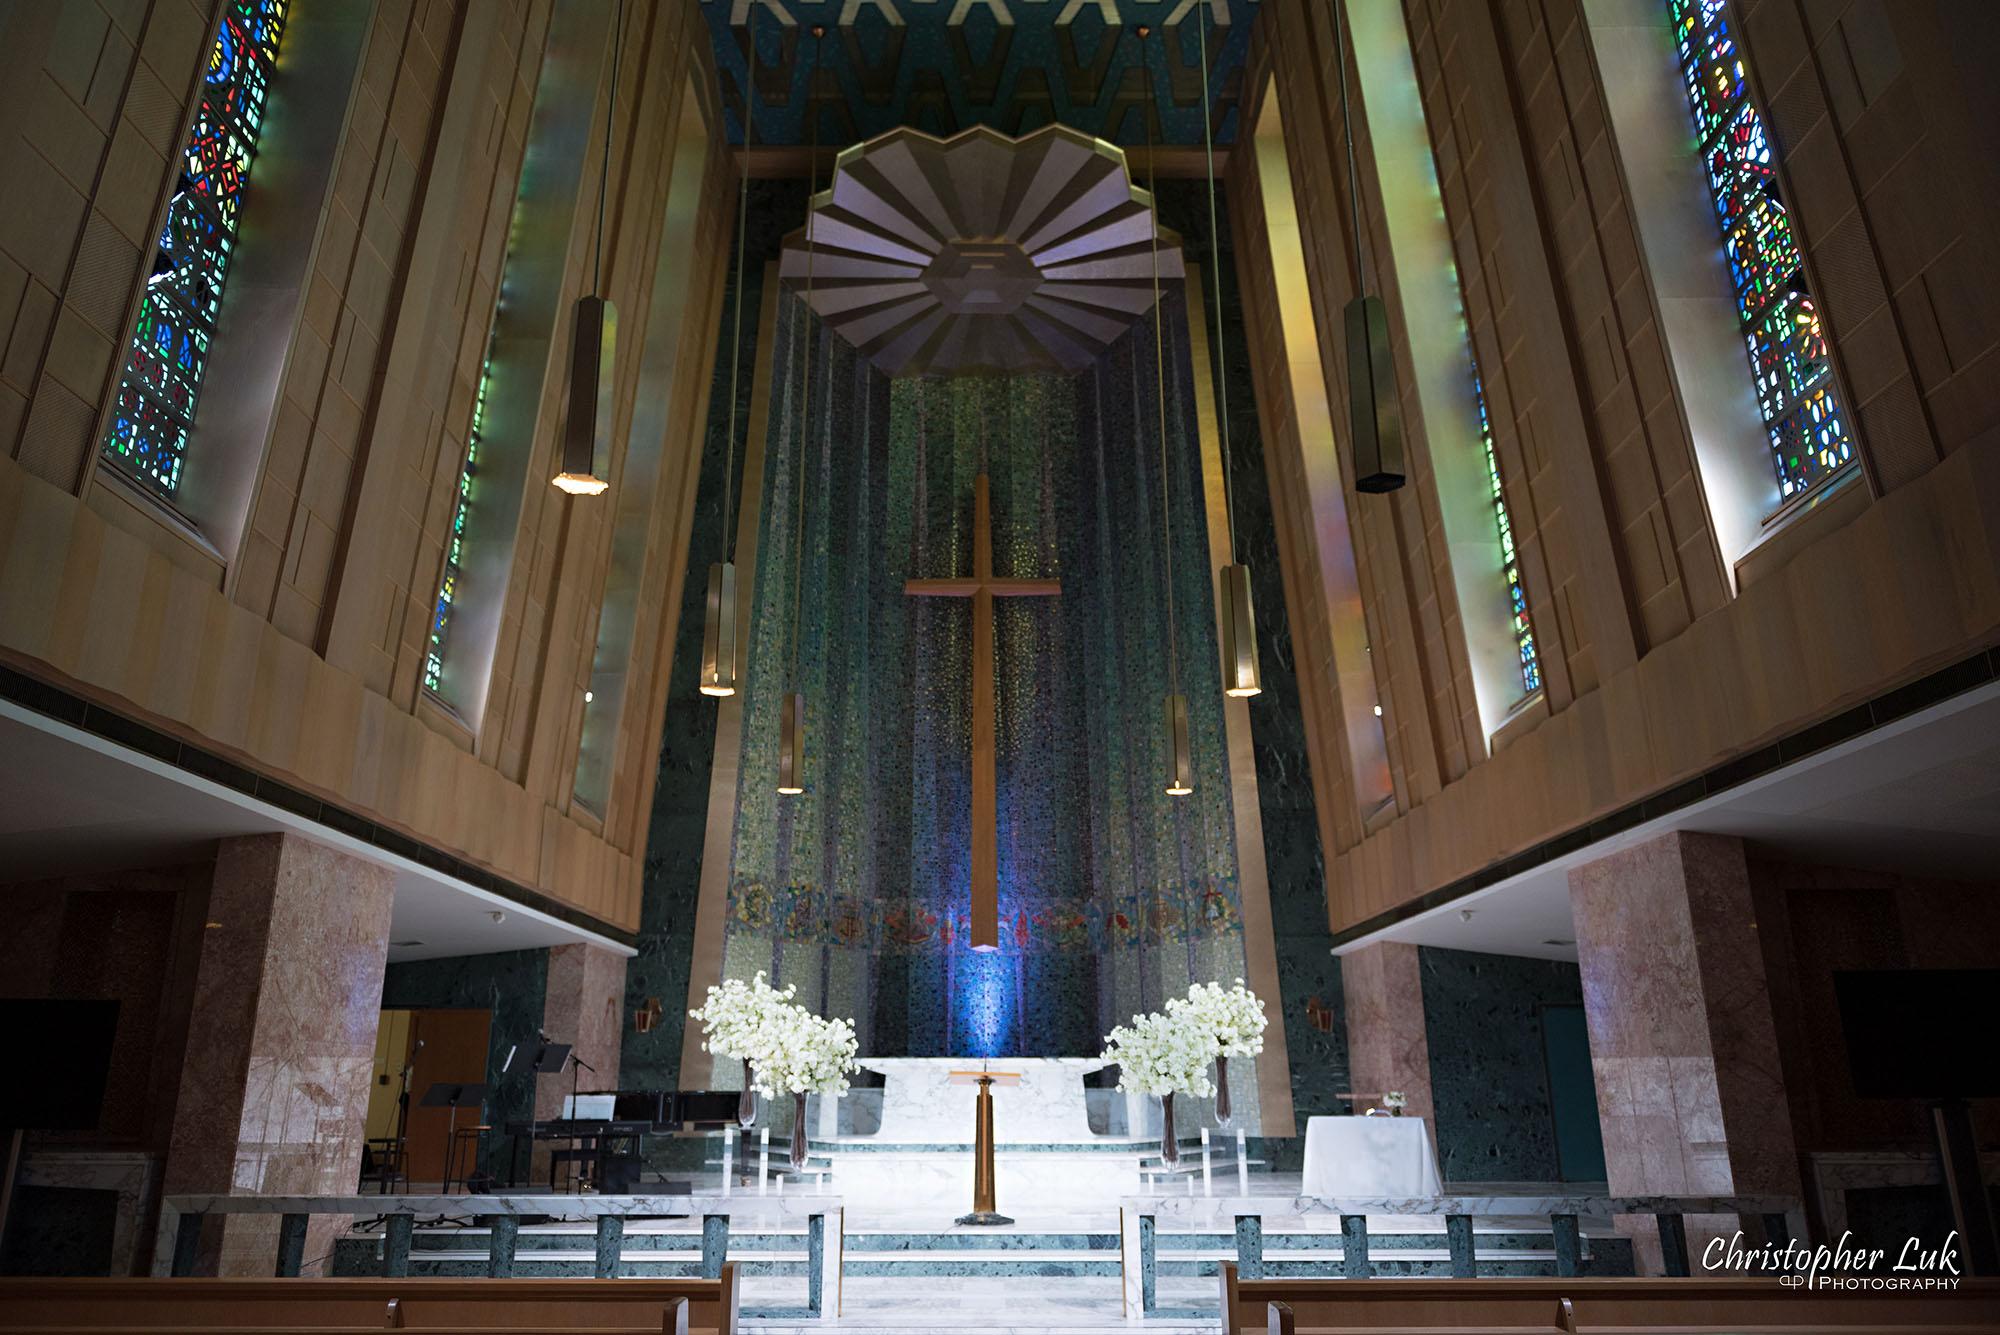 Christopher Luk Toronto Wedding Photography Tyndale Chapel Church Ceremony Venue Location Altar Landscape